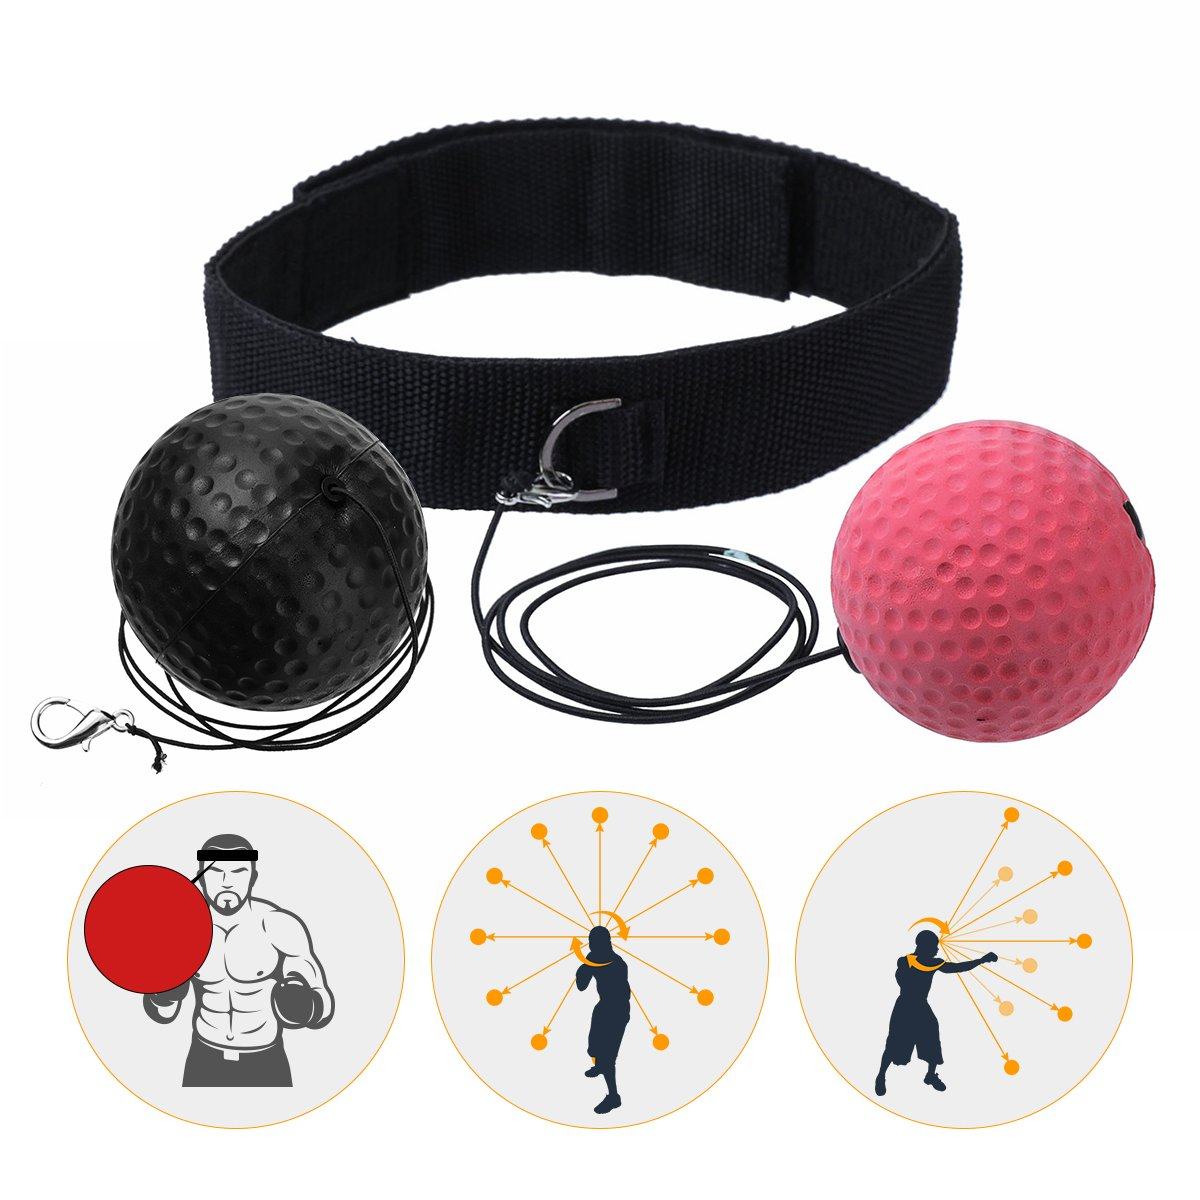 SGODDE Reflejo de Boxeo Ball, Speed Fitness Punch Boxing Ball con Diadema, Dispositivo de Entrenamiento Speedball para Entrenamiento de Boxeo en Casa y al Aire Libre